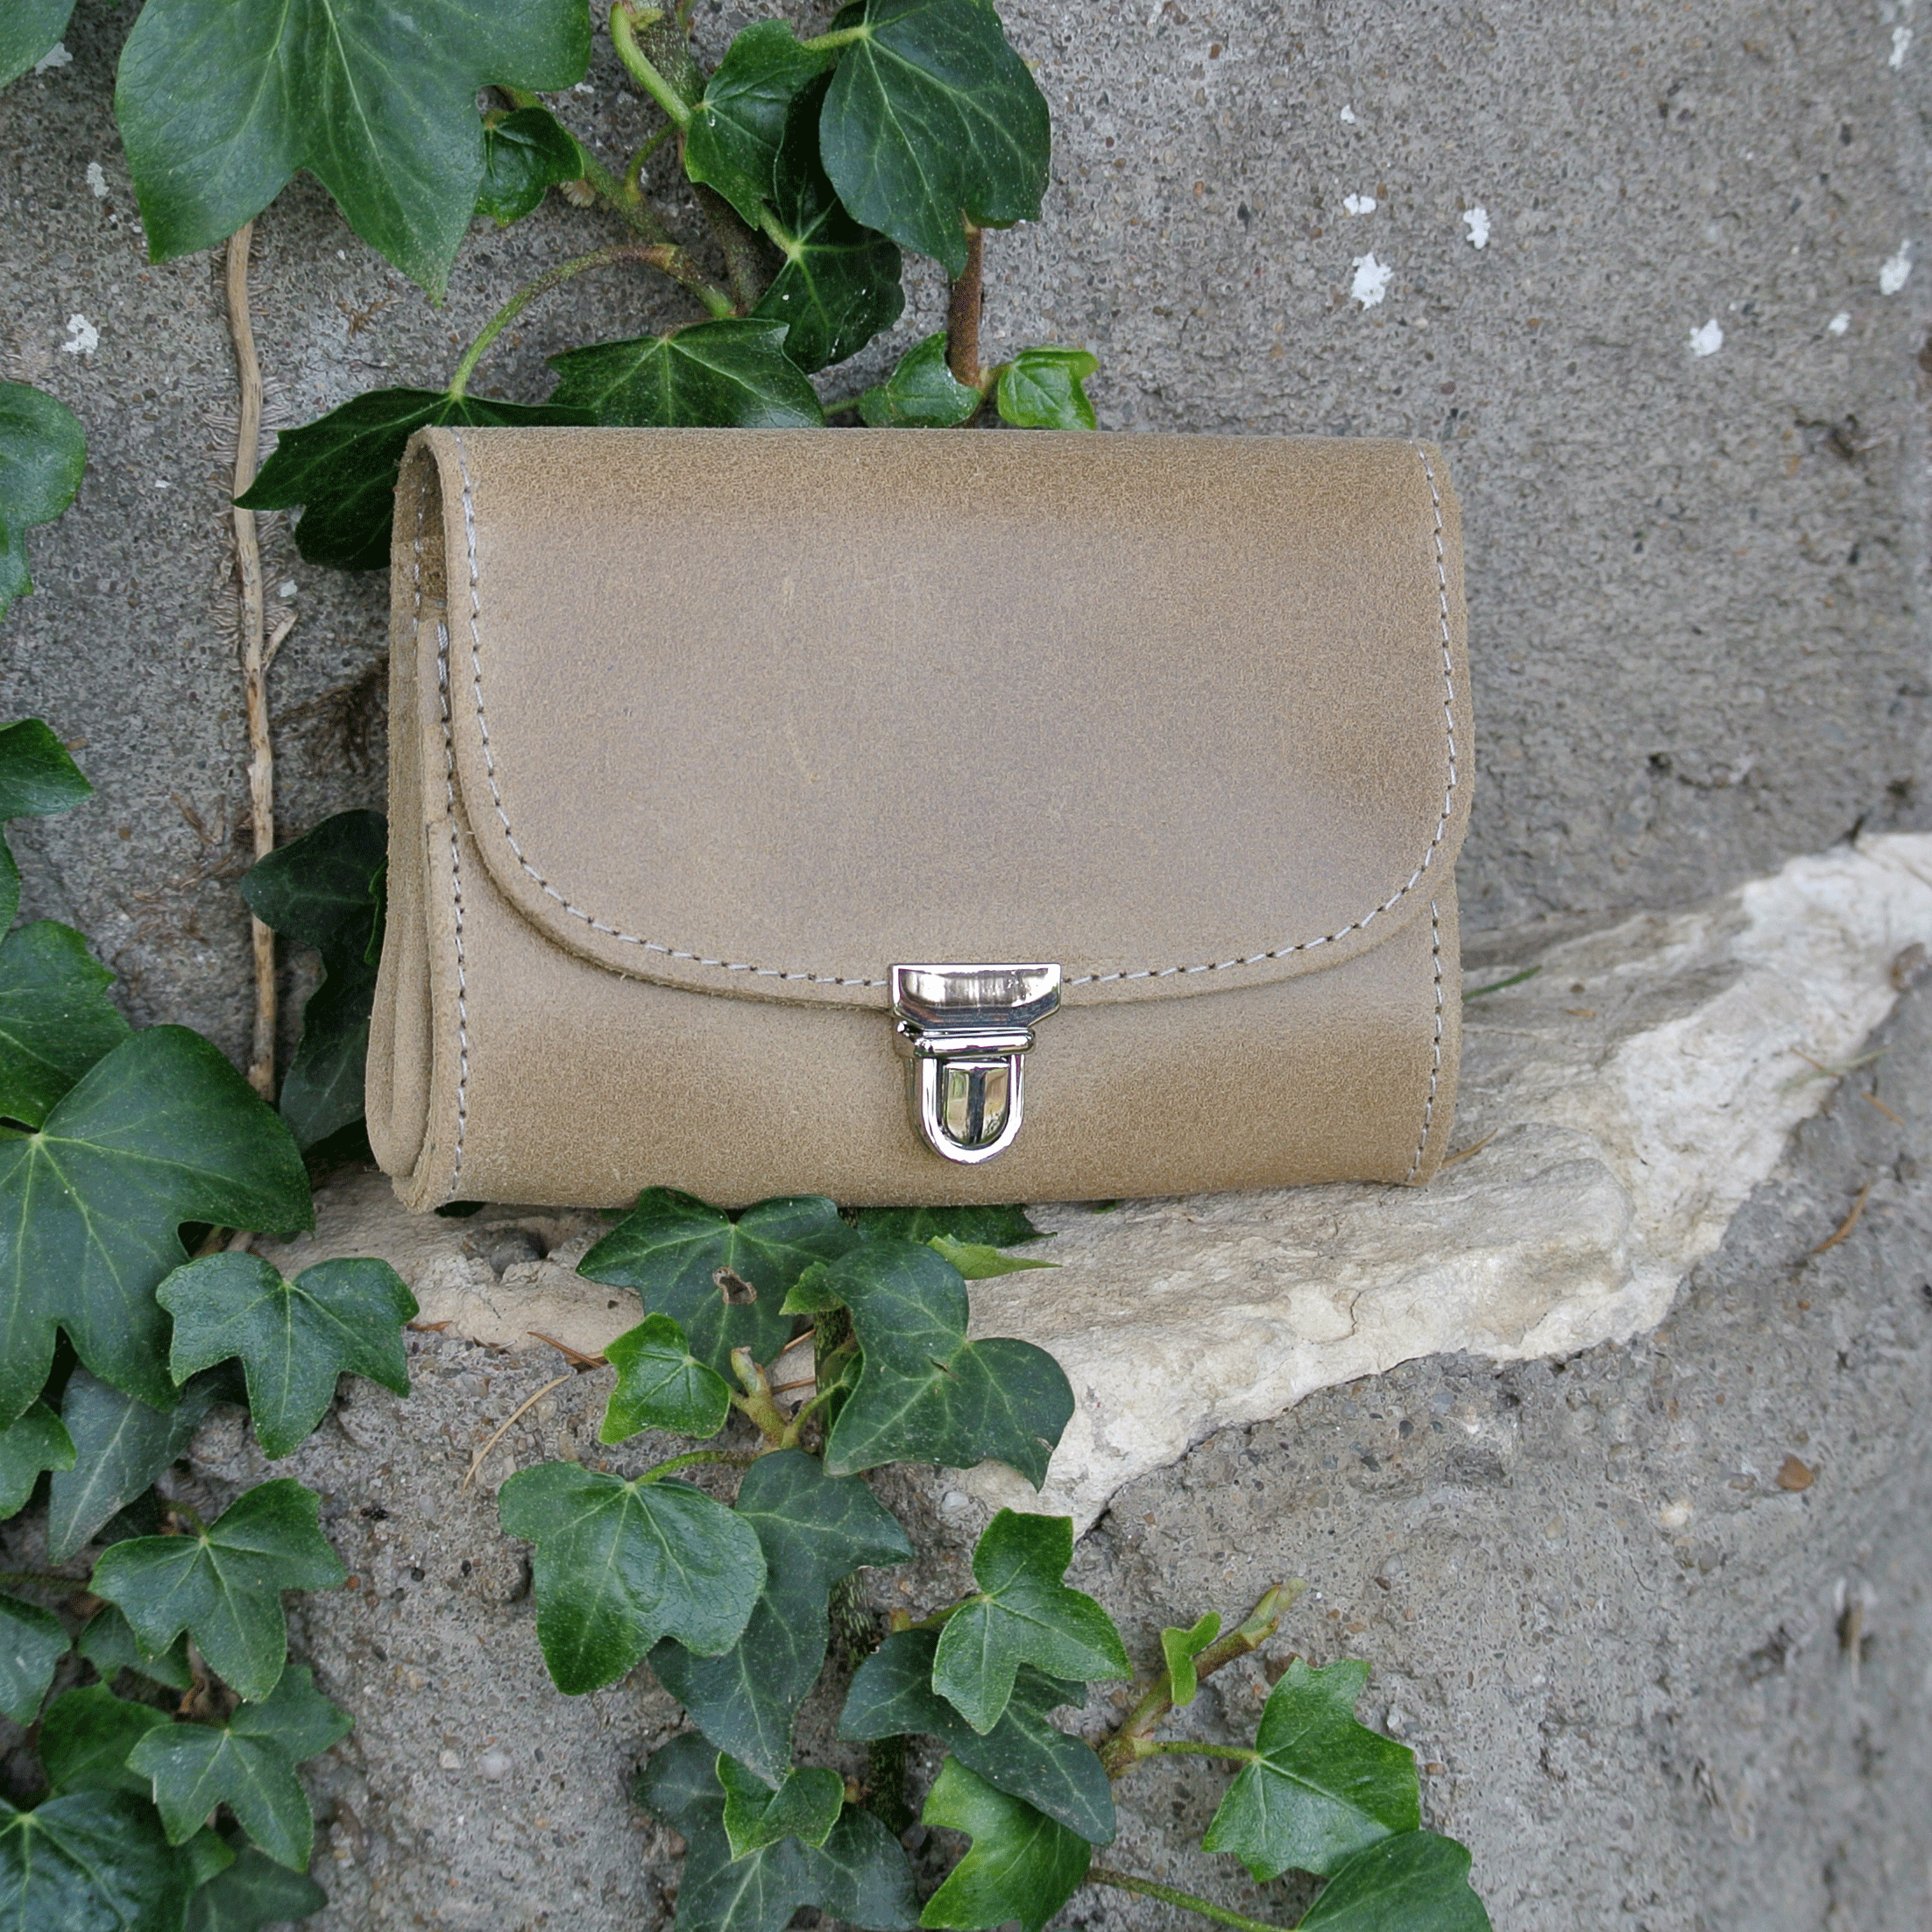 portefeuille-royale-en-cuir-retro-beige-coquillage